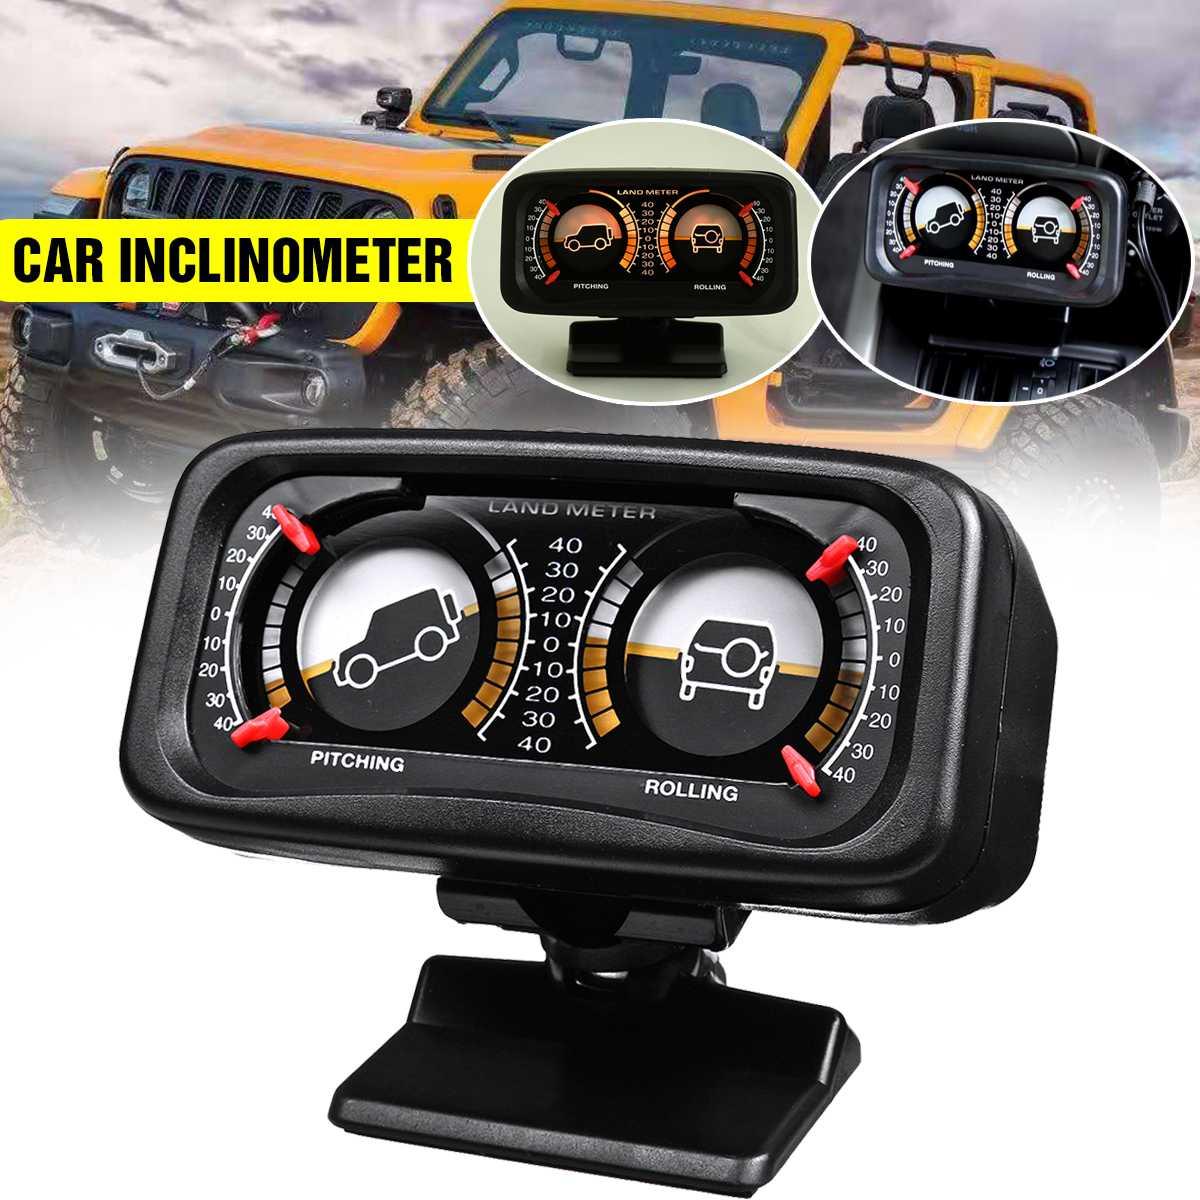 12V SUV Car Inclinometer Gradient Slope Angle Level Meter Compass Tilt Indicator